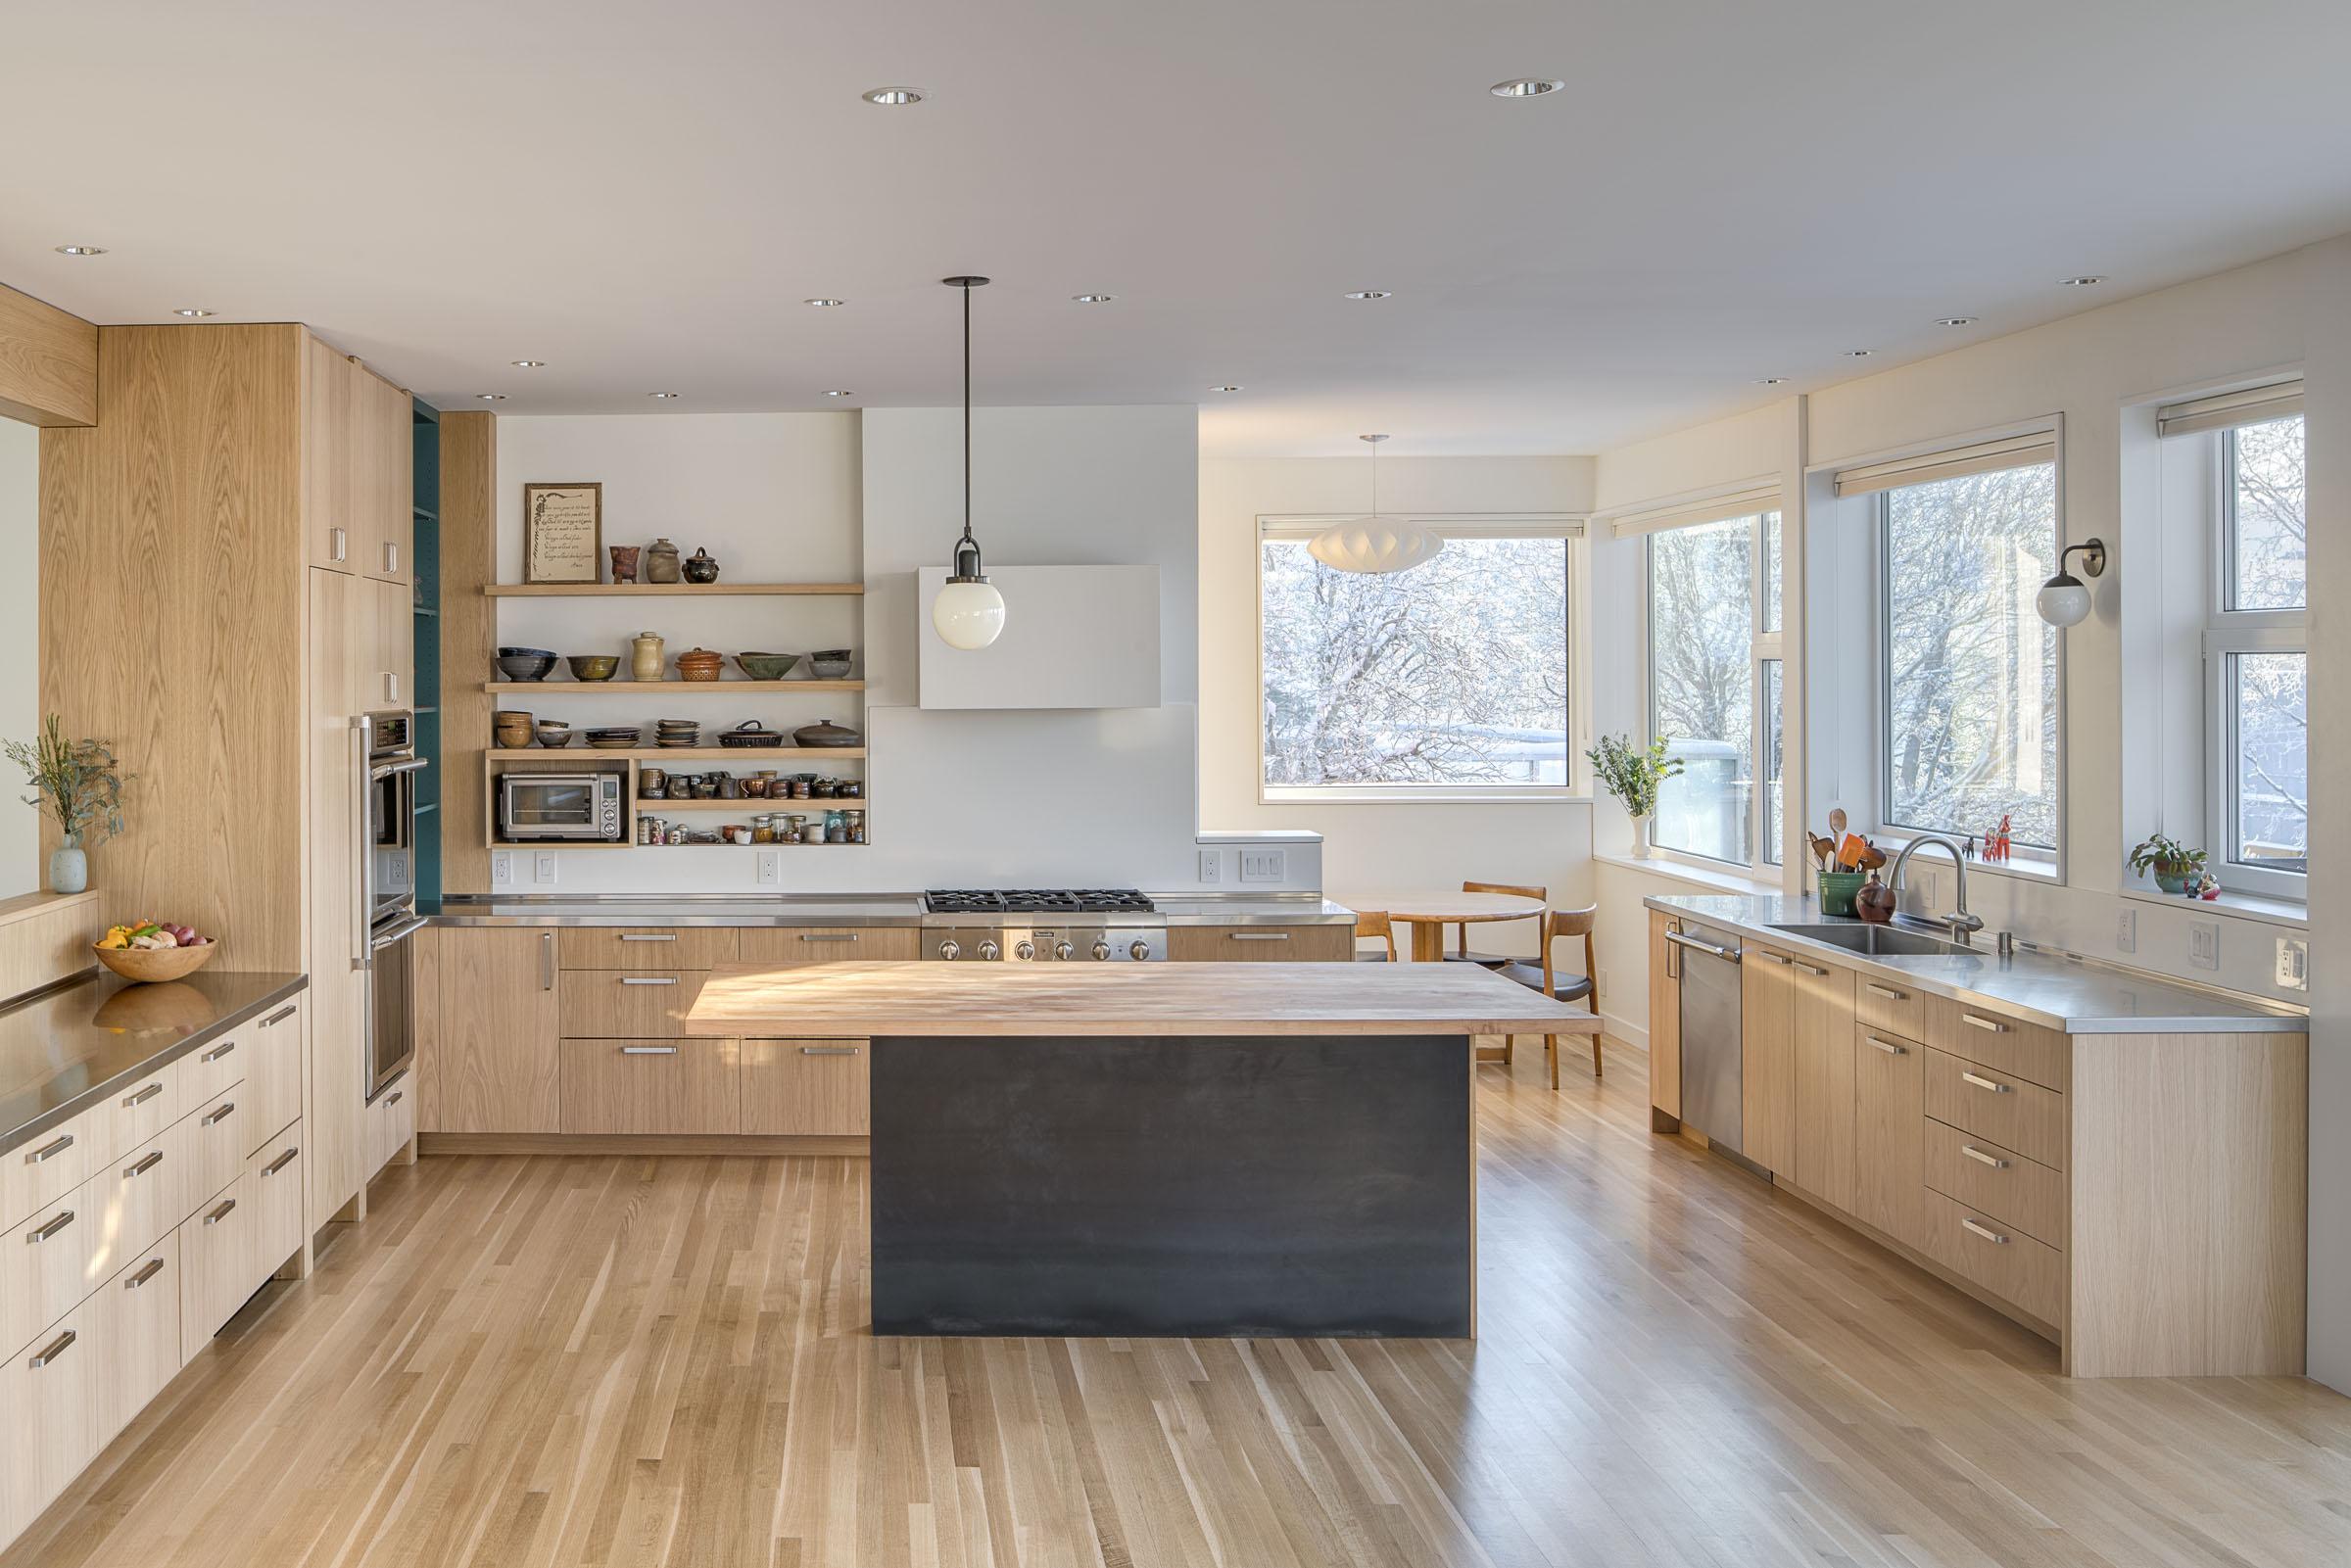 redhouseno2-kitchen.jpg